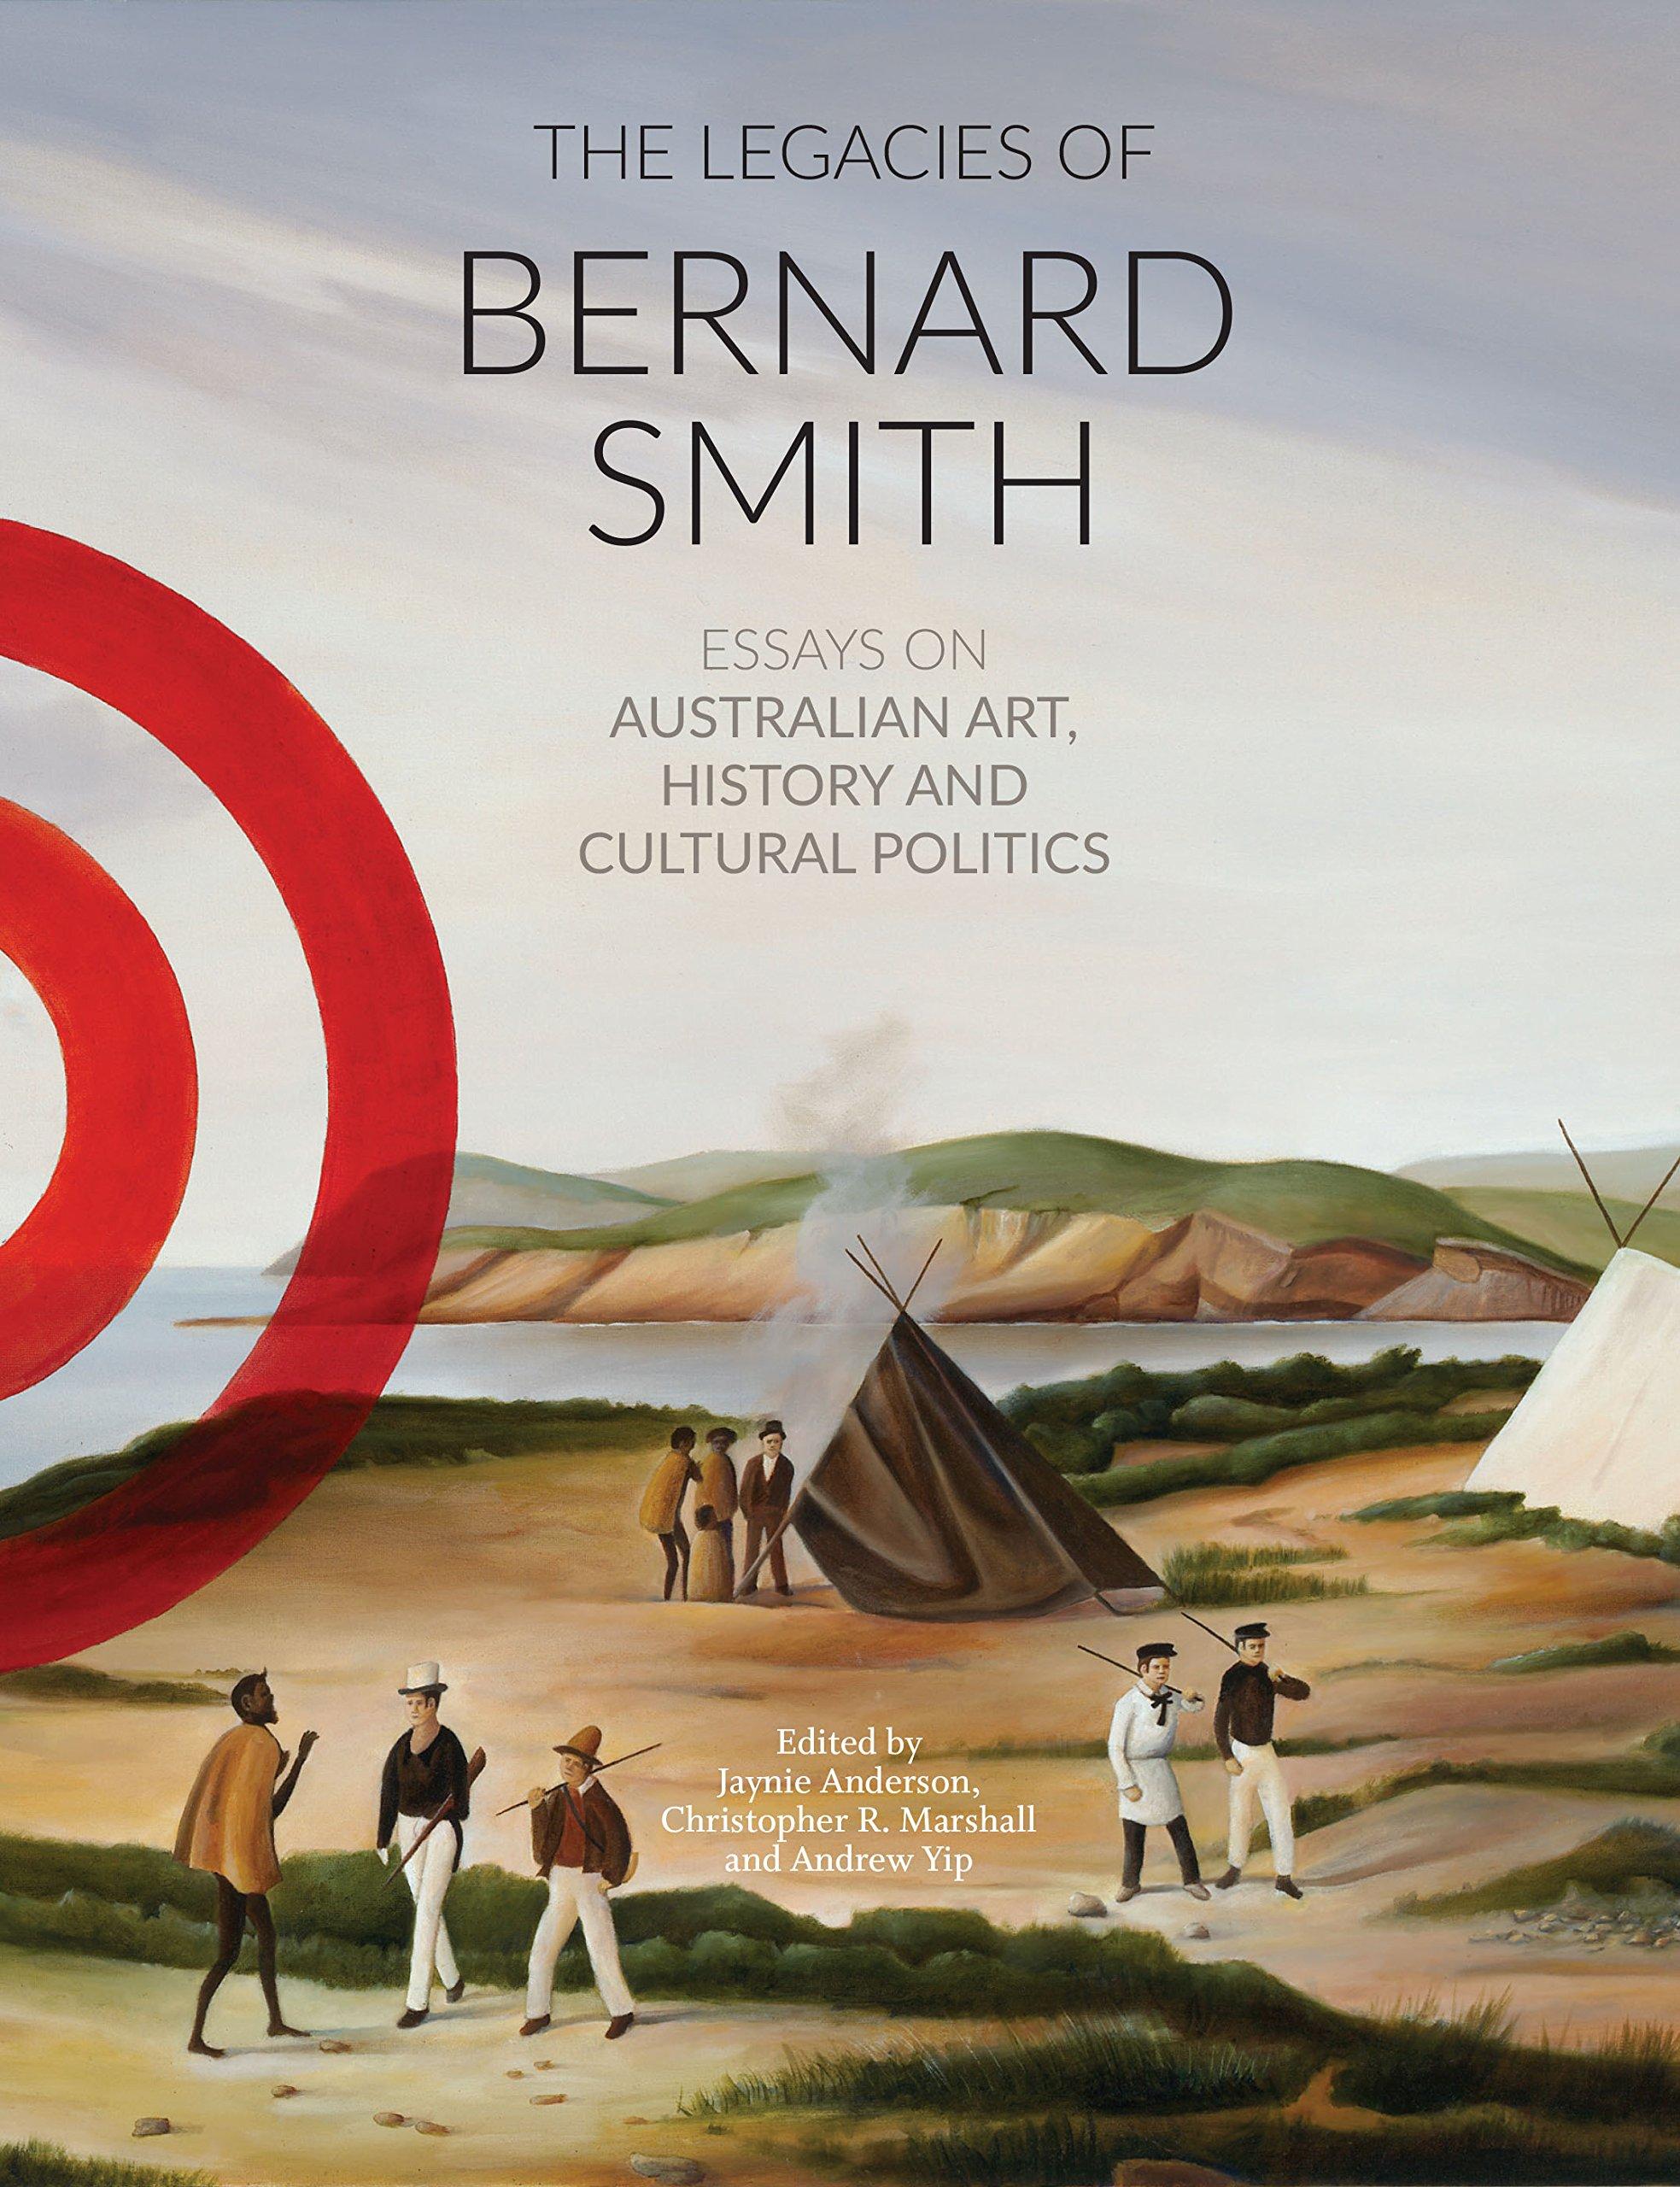 The Legacies of Bernard Smith: Essays on Australian Art, History and Cultural Politics PDF